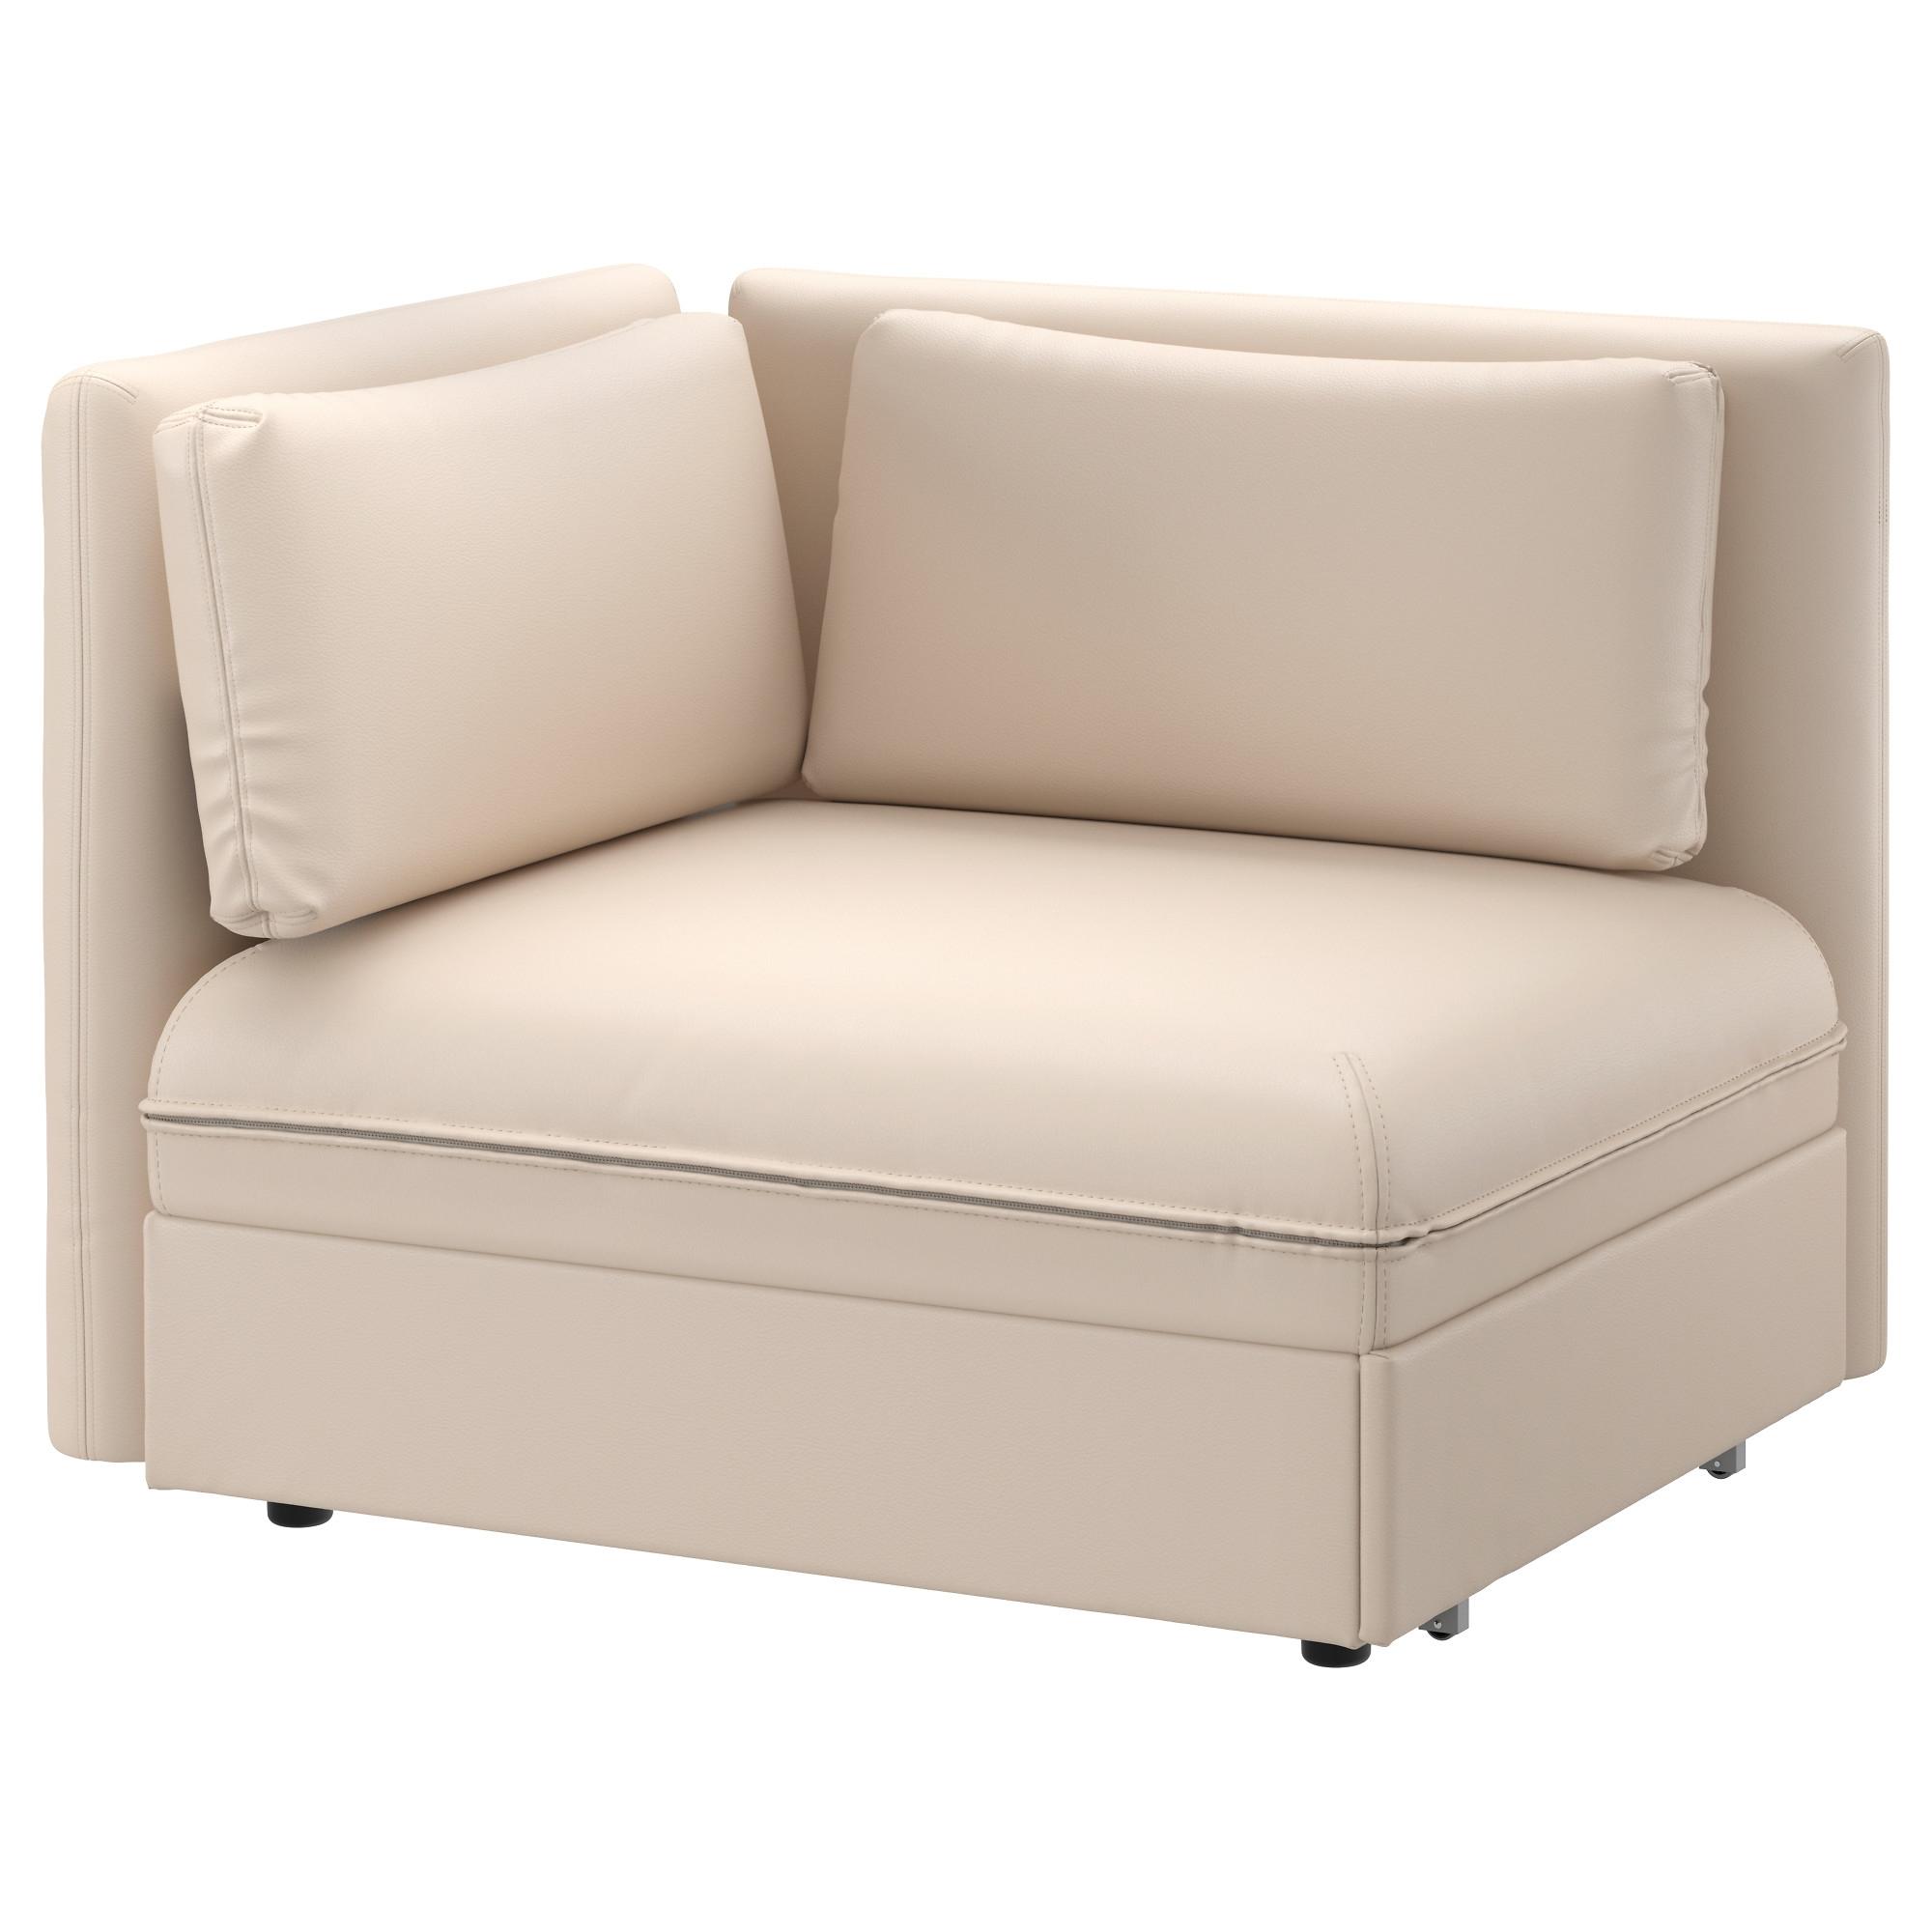 VALLENTUNA módulo asiento+cama+respaldo